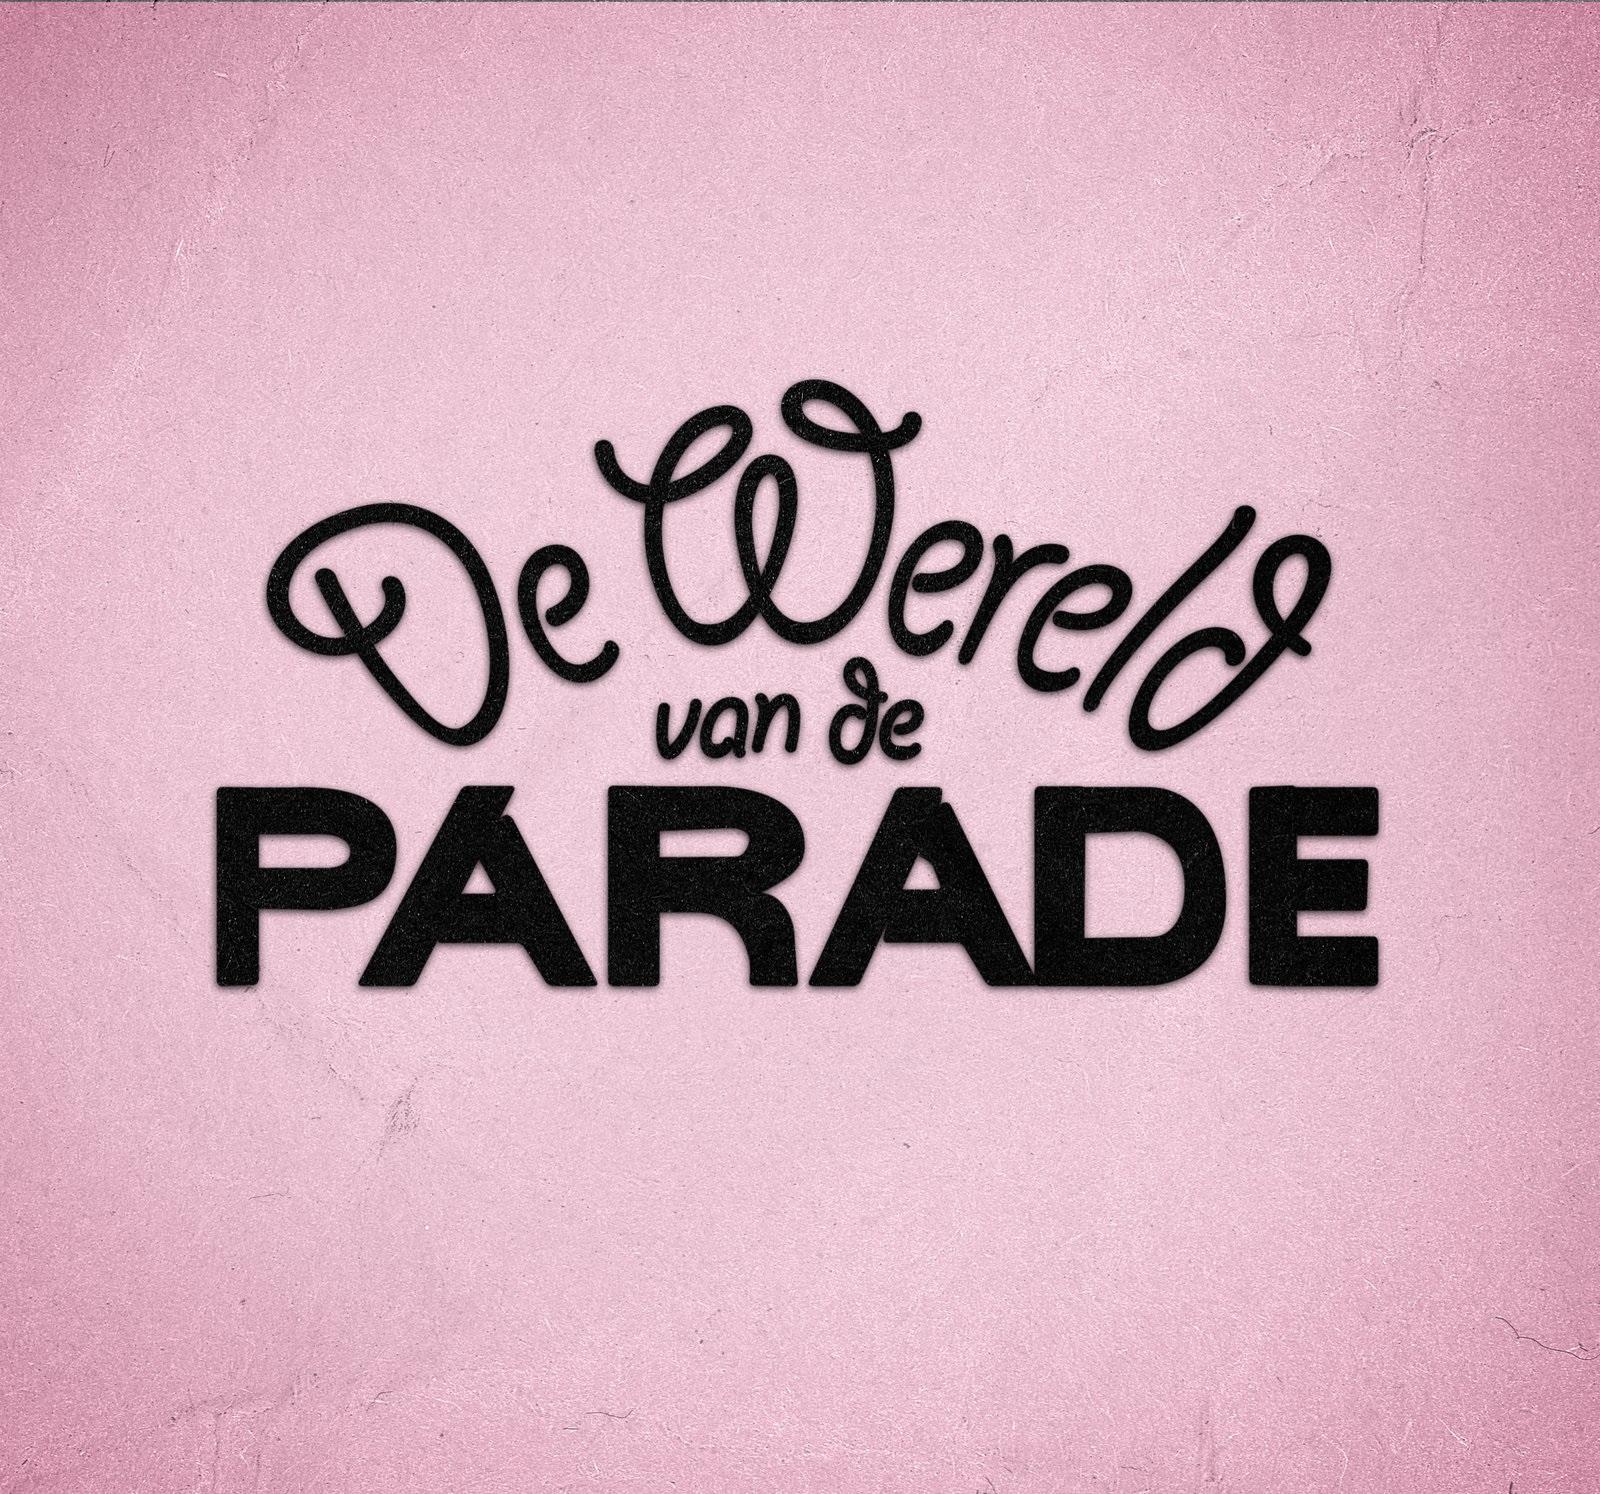 De Wereld van de Parade